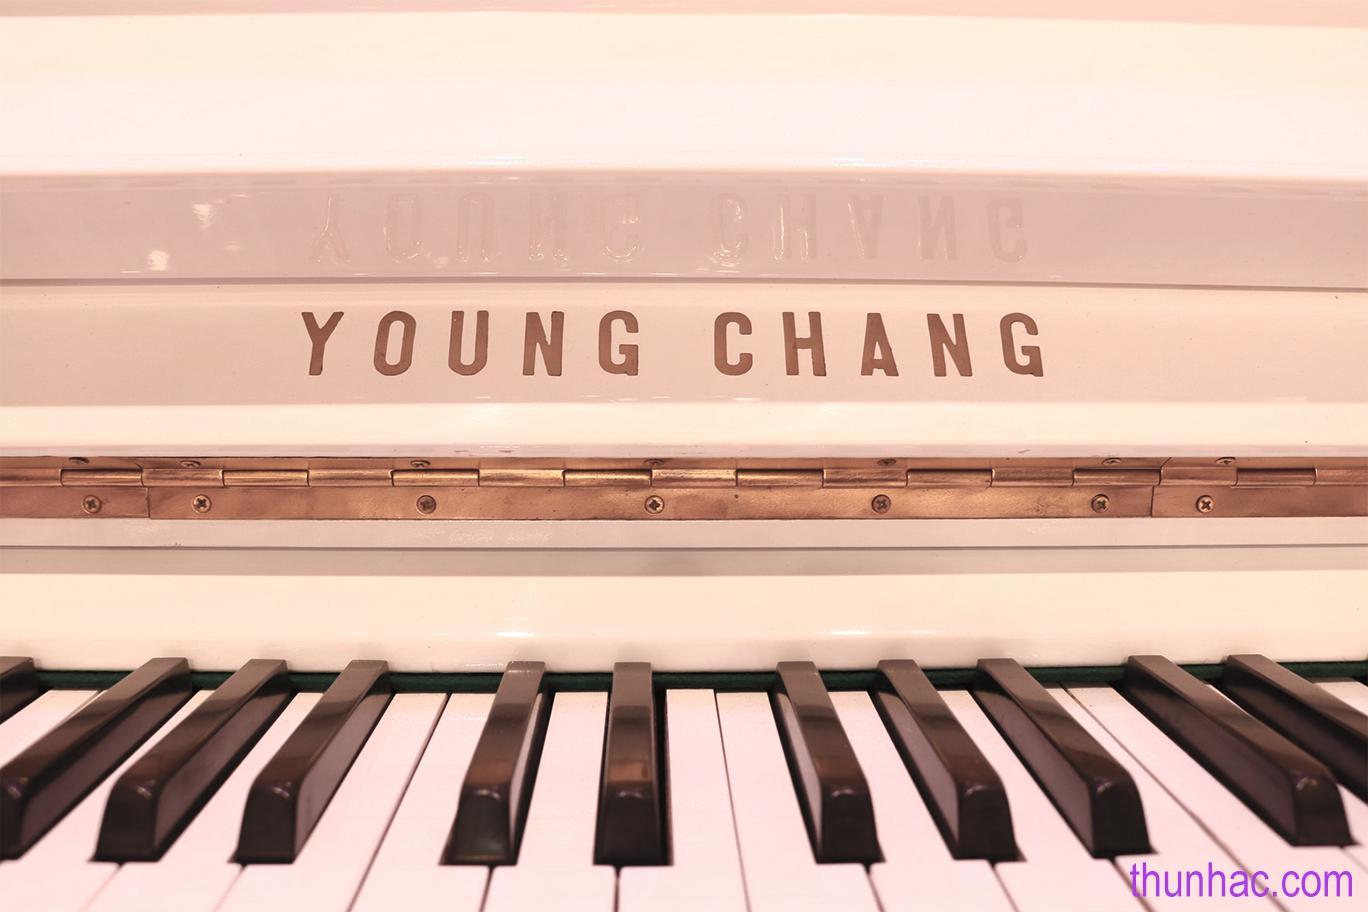 đia-diem-ban-dan-piano-chat-luong-cao-tphcm